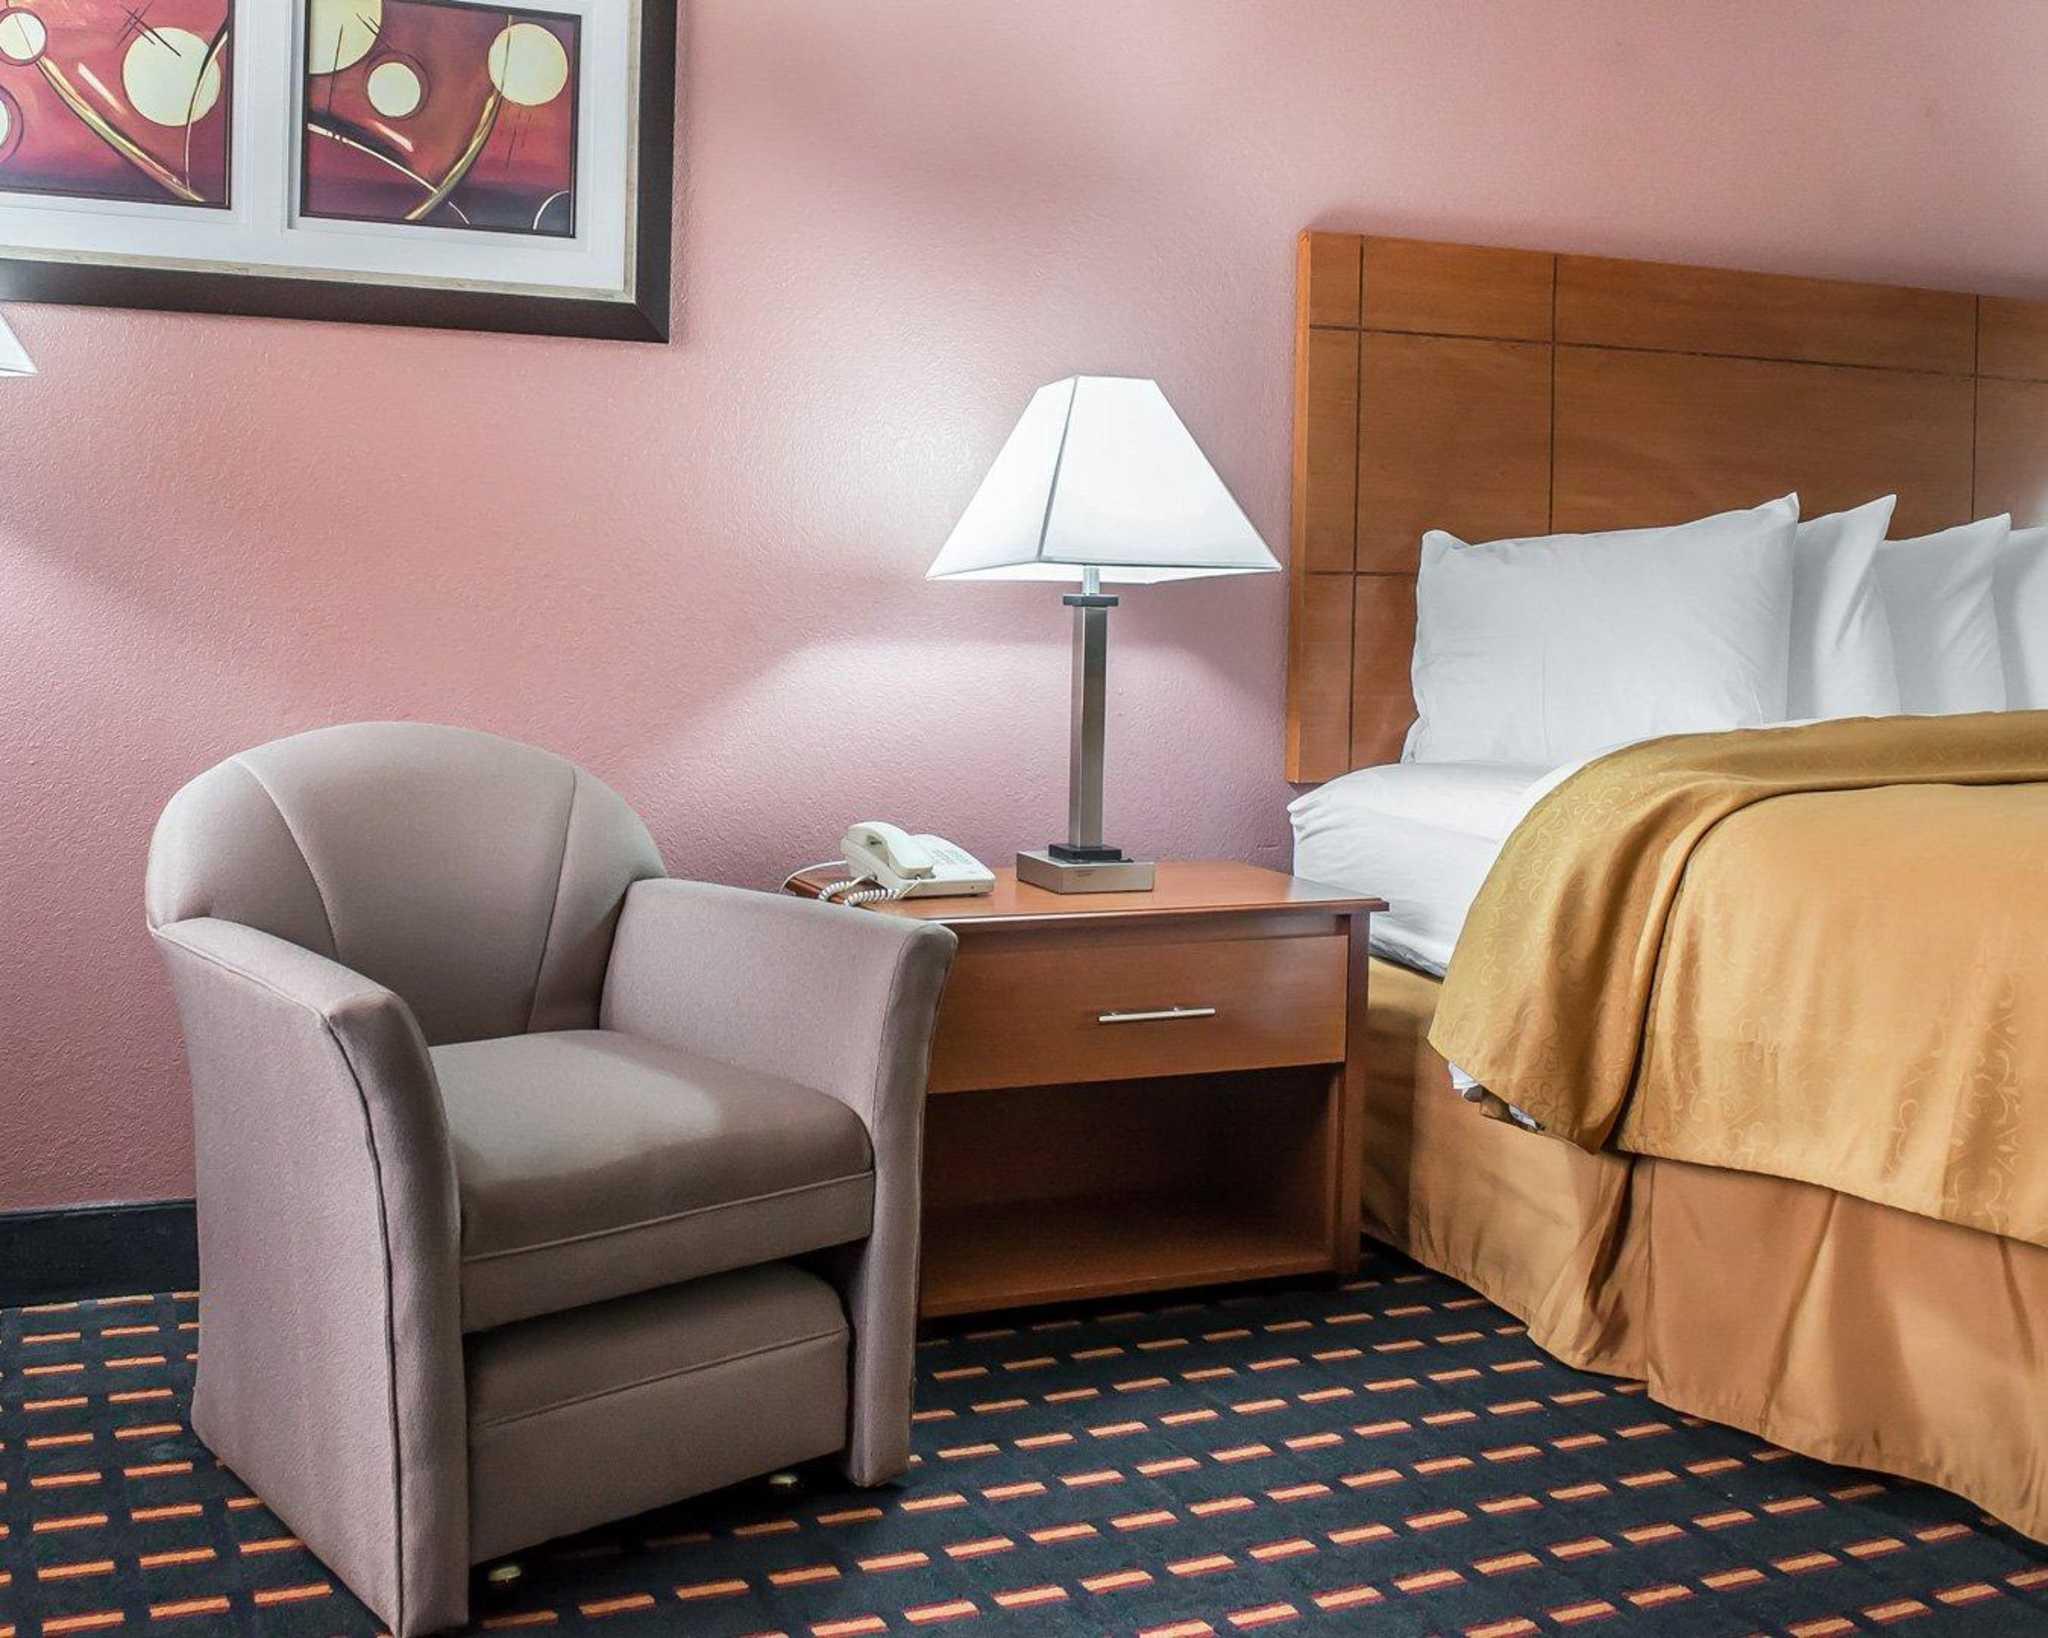 Quality Inn image 20